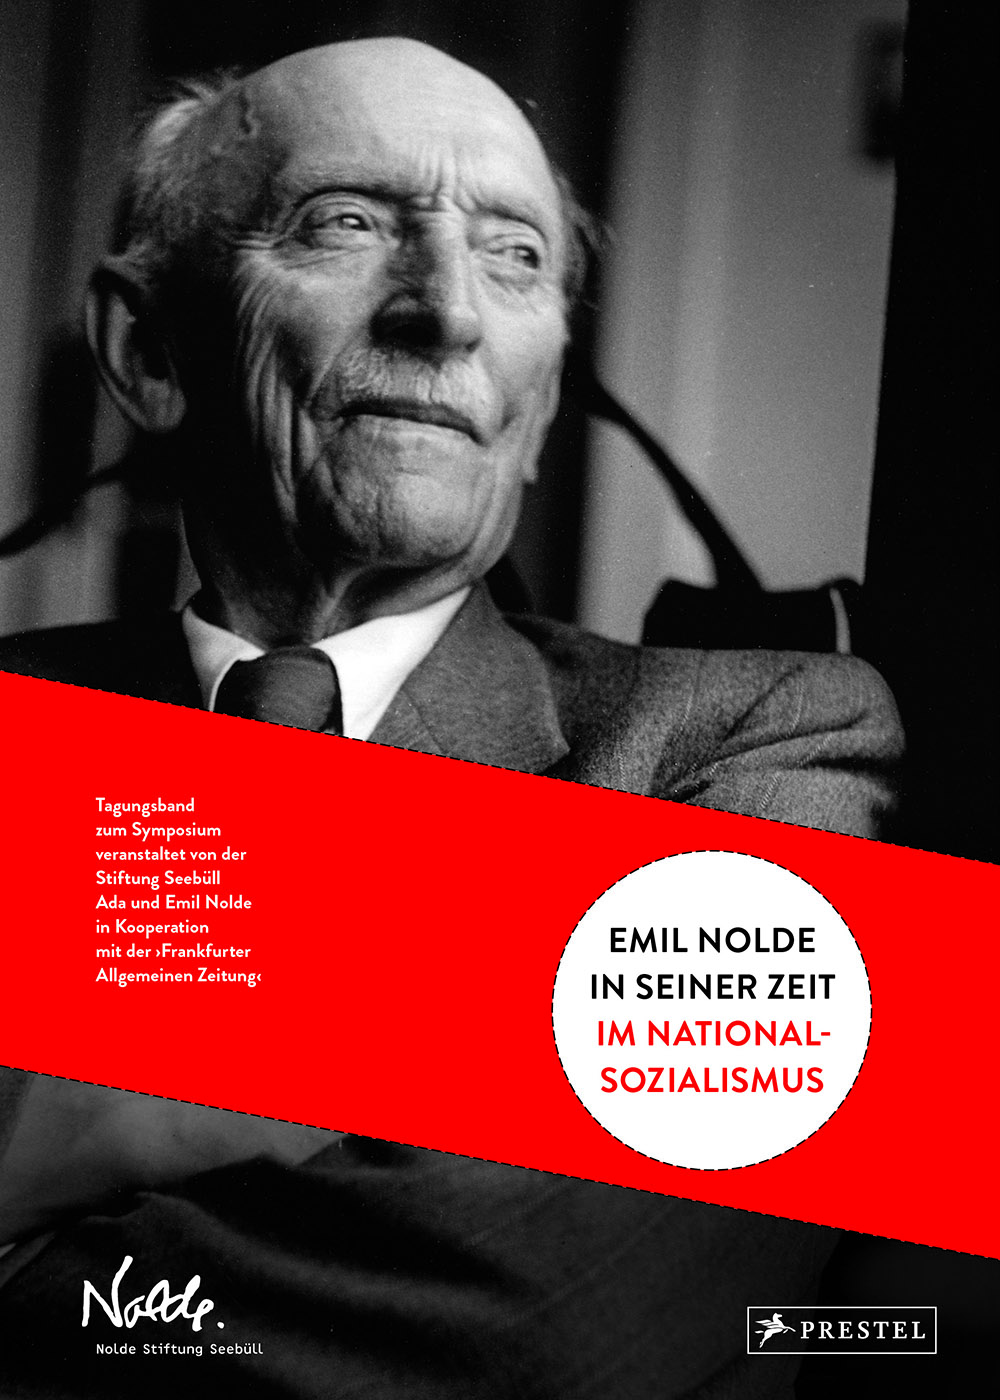 nolde im nationalsozialismus